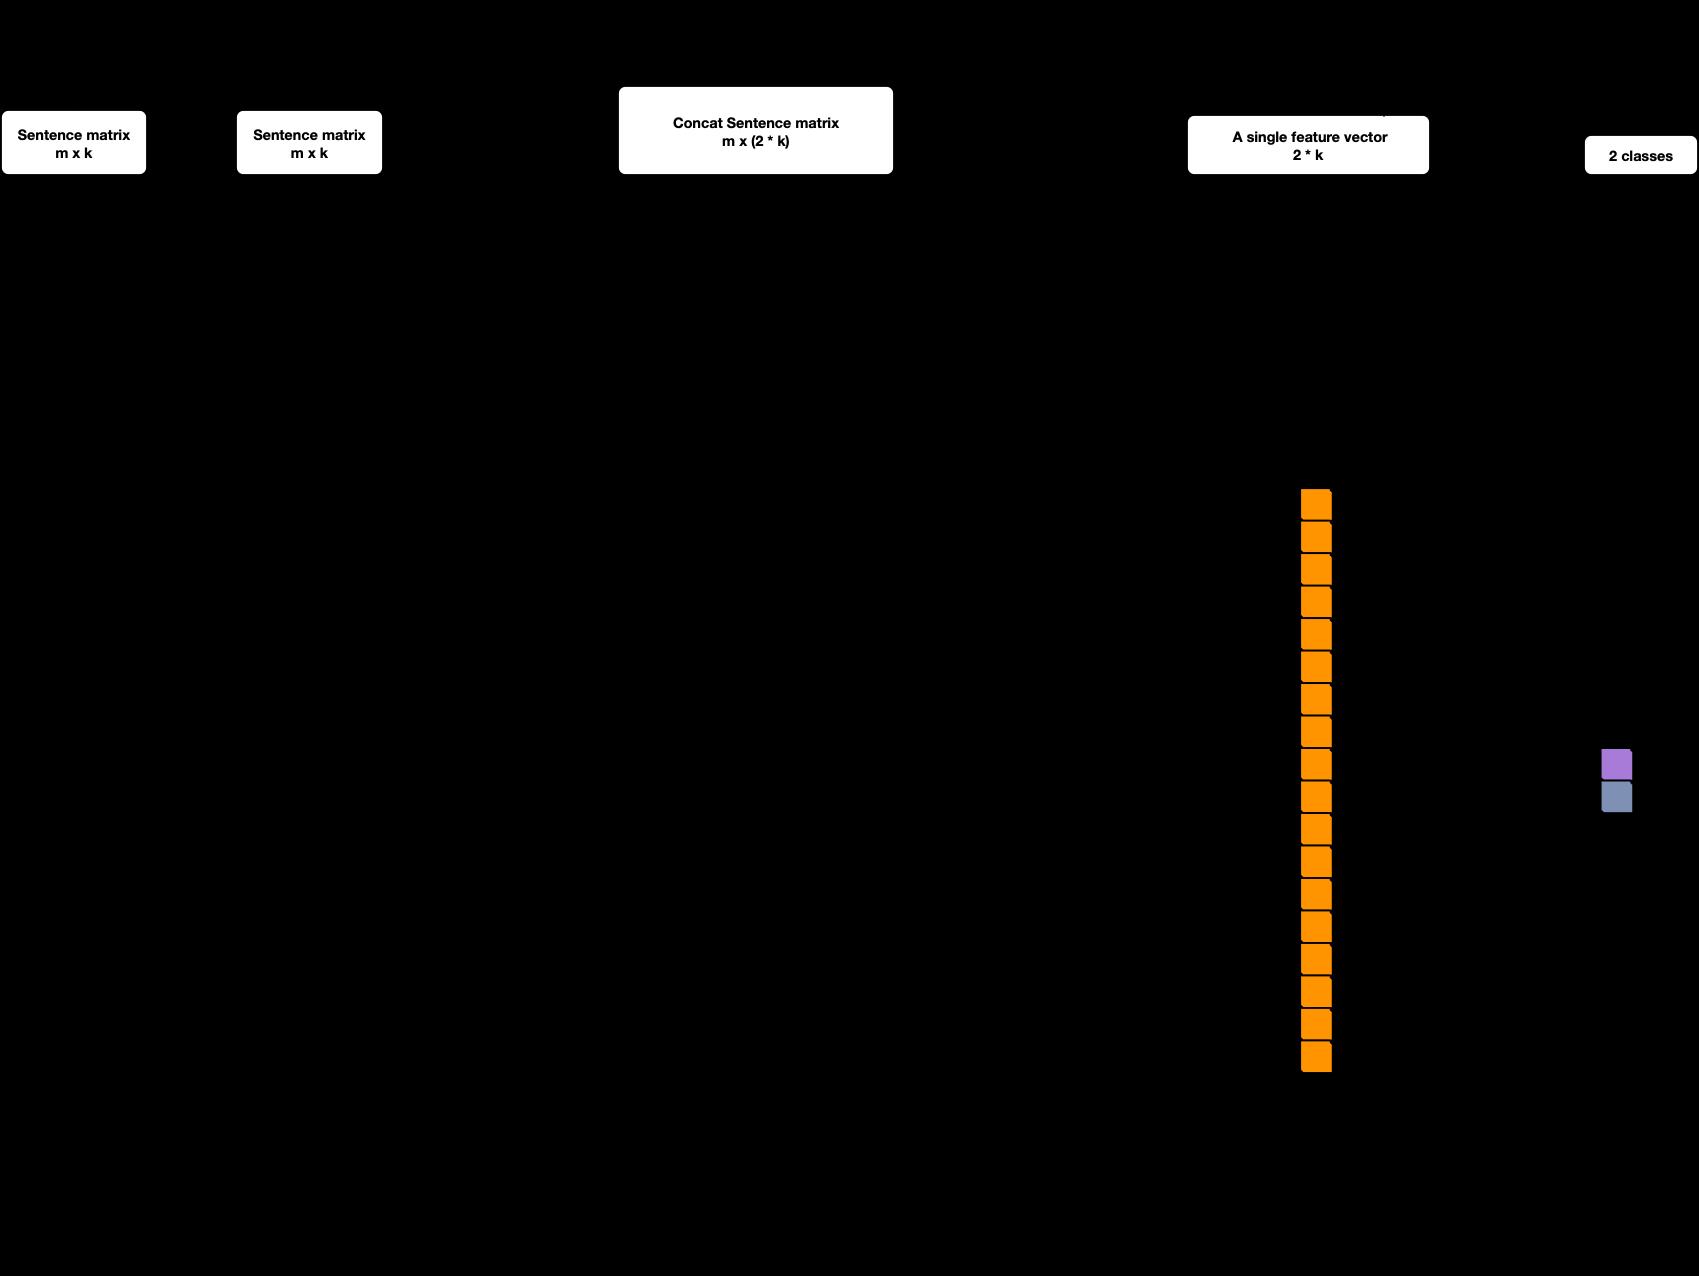 GitHub - RandolphVI/Text-Pairs-Relation-Classification